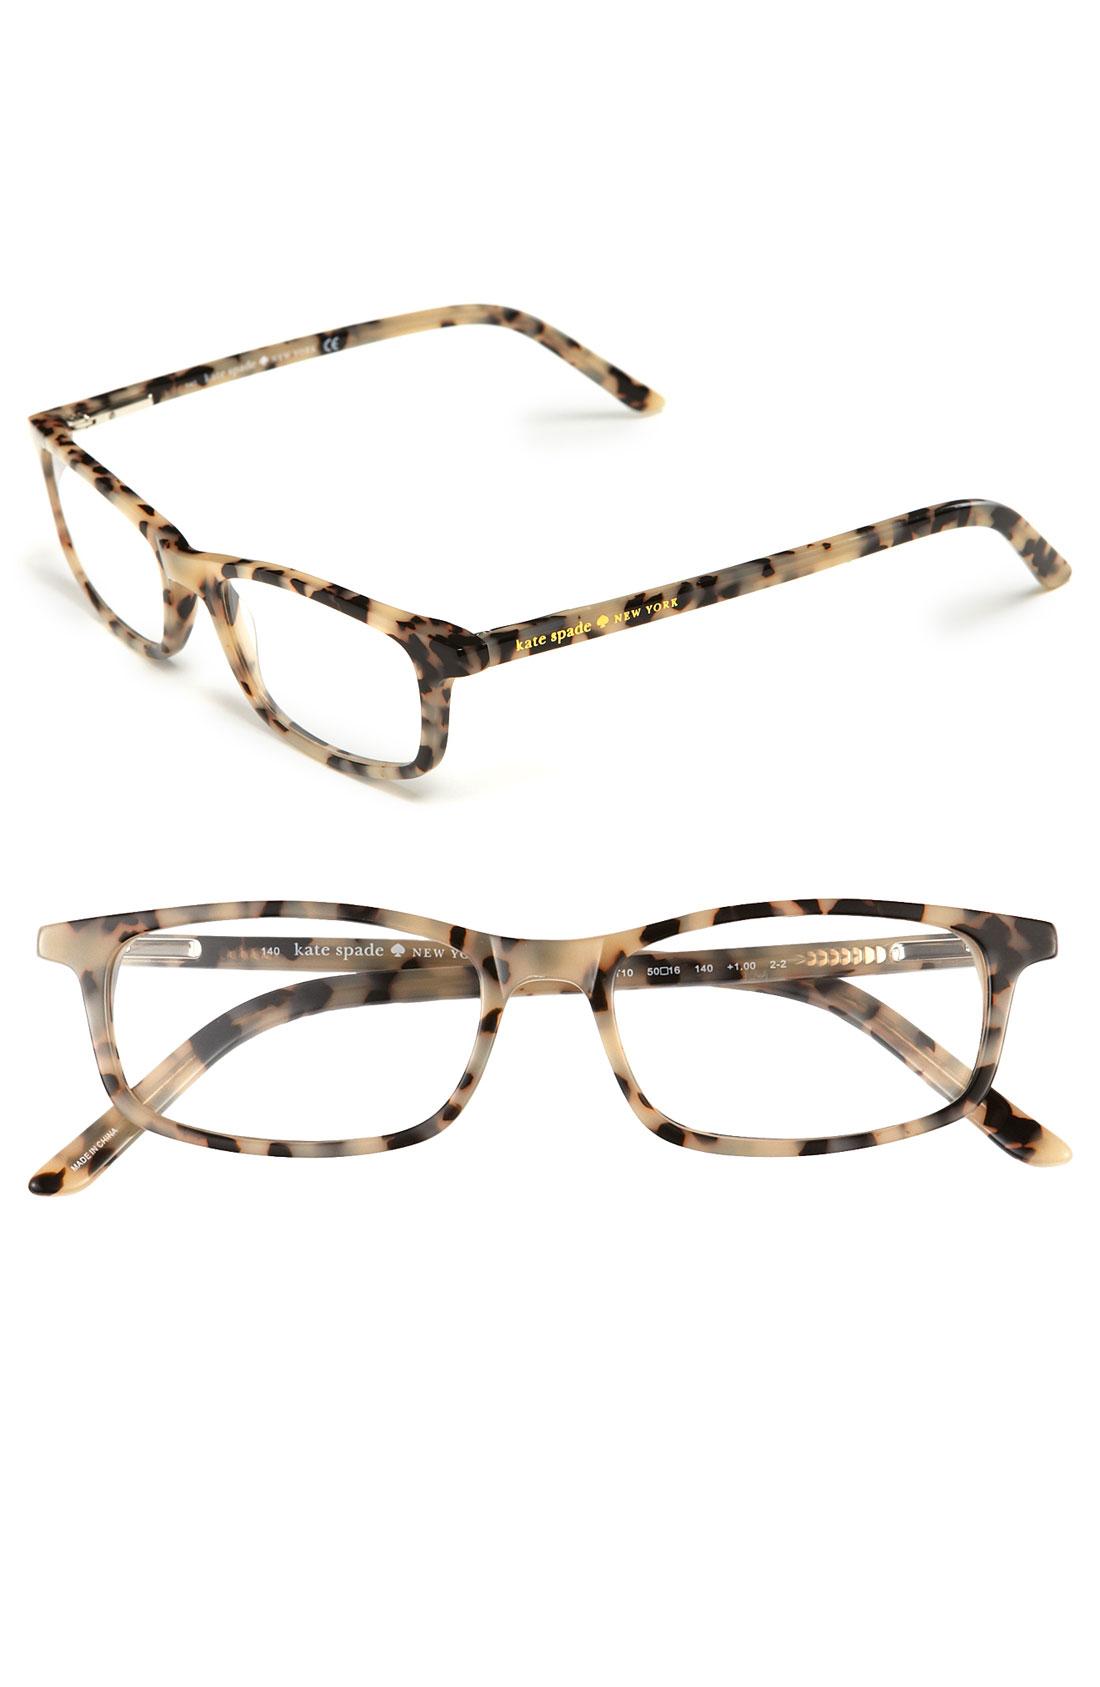 Kate Spade Tortoise Shell Eyeglass Frames : Kate Spade Jodie Reading Glasses 2 For 88 in Brown (milky ...